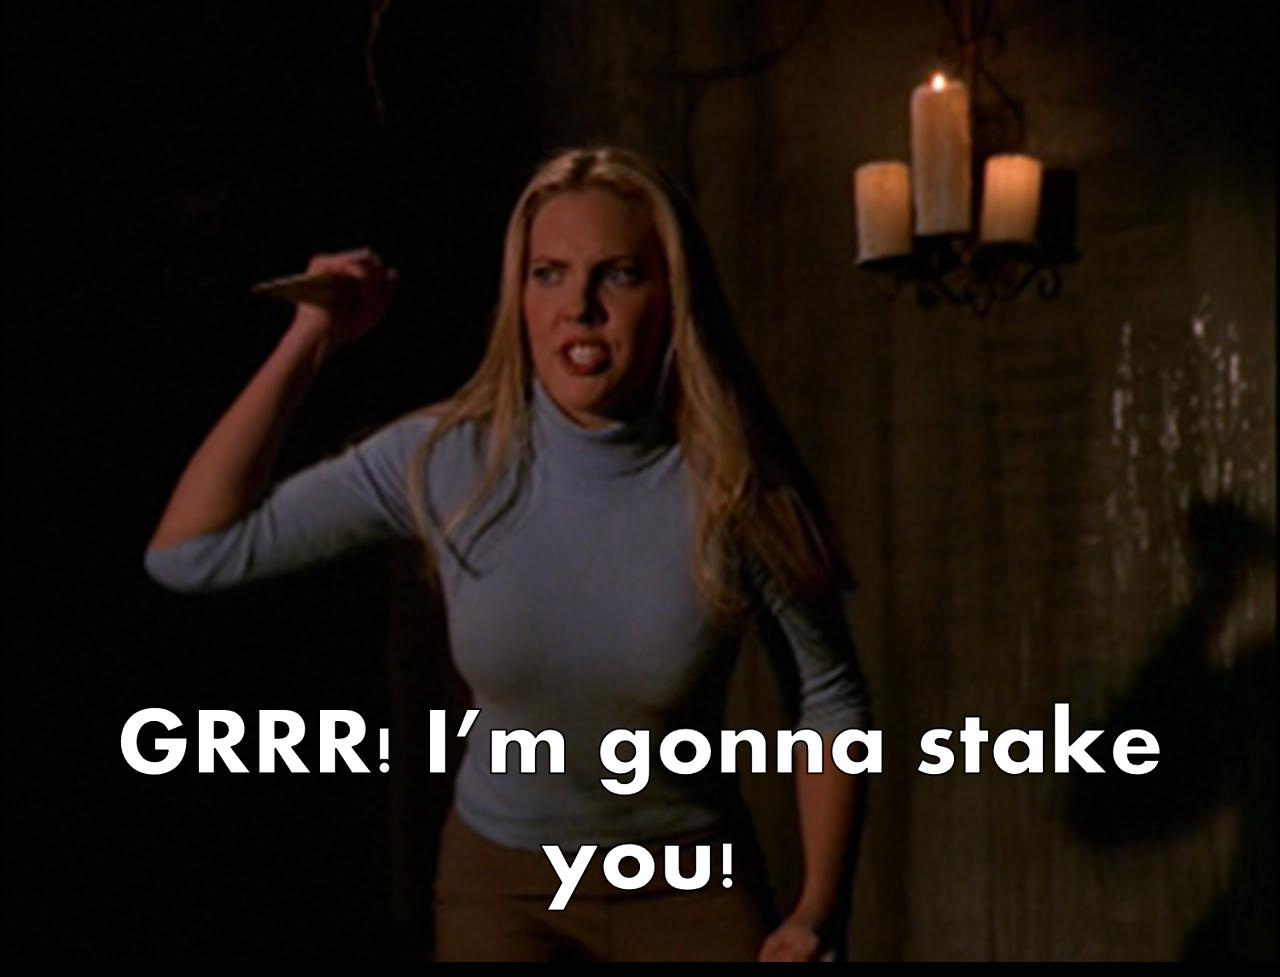 Harmony (pretending to be Buffy) | Buffy style, Vampire slayer, Buffy the vampire slayer